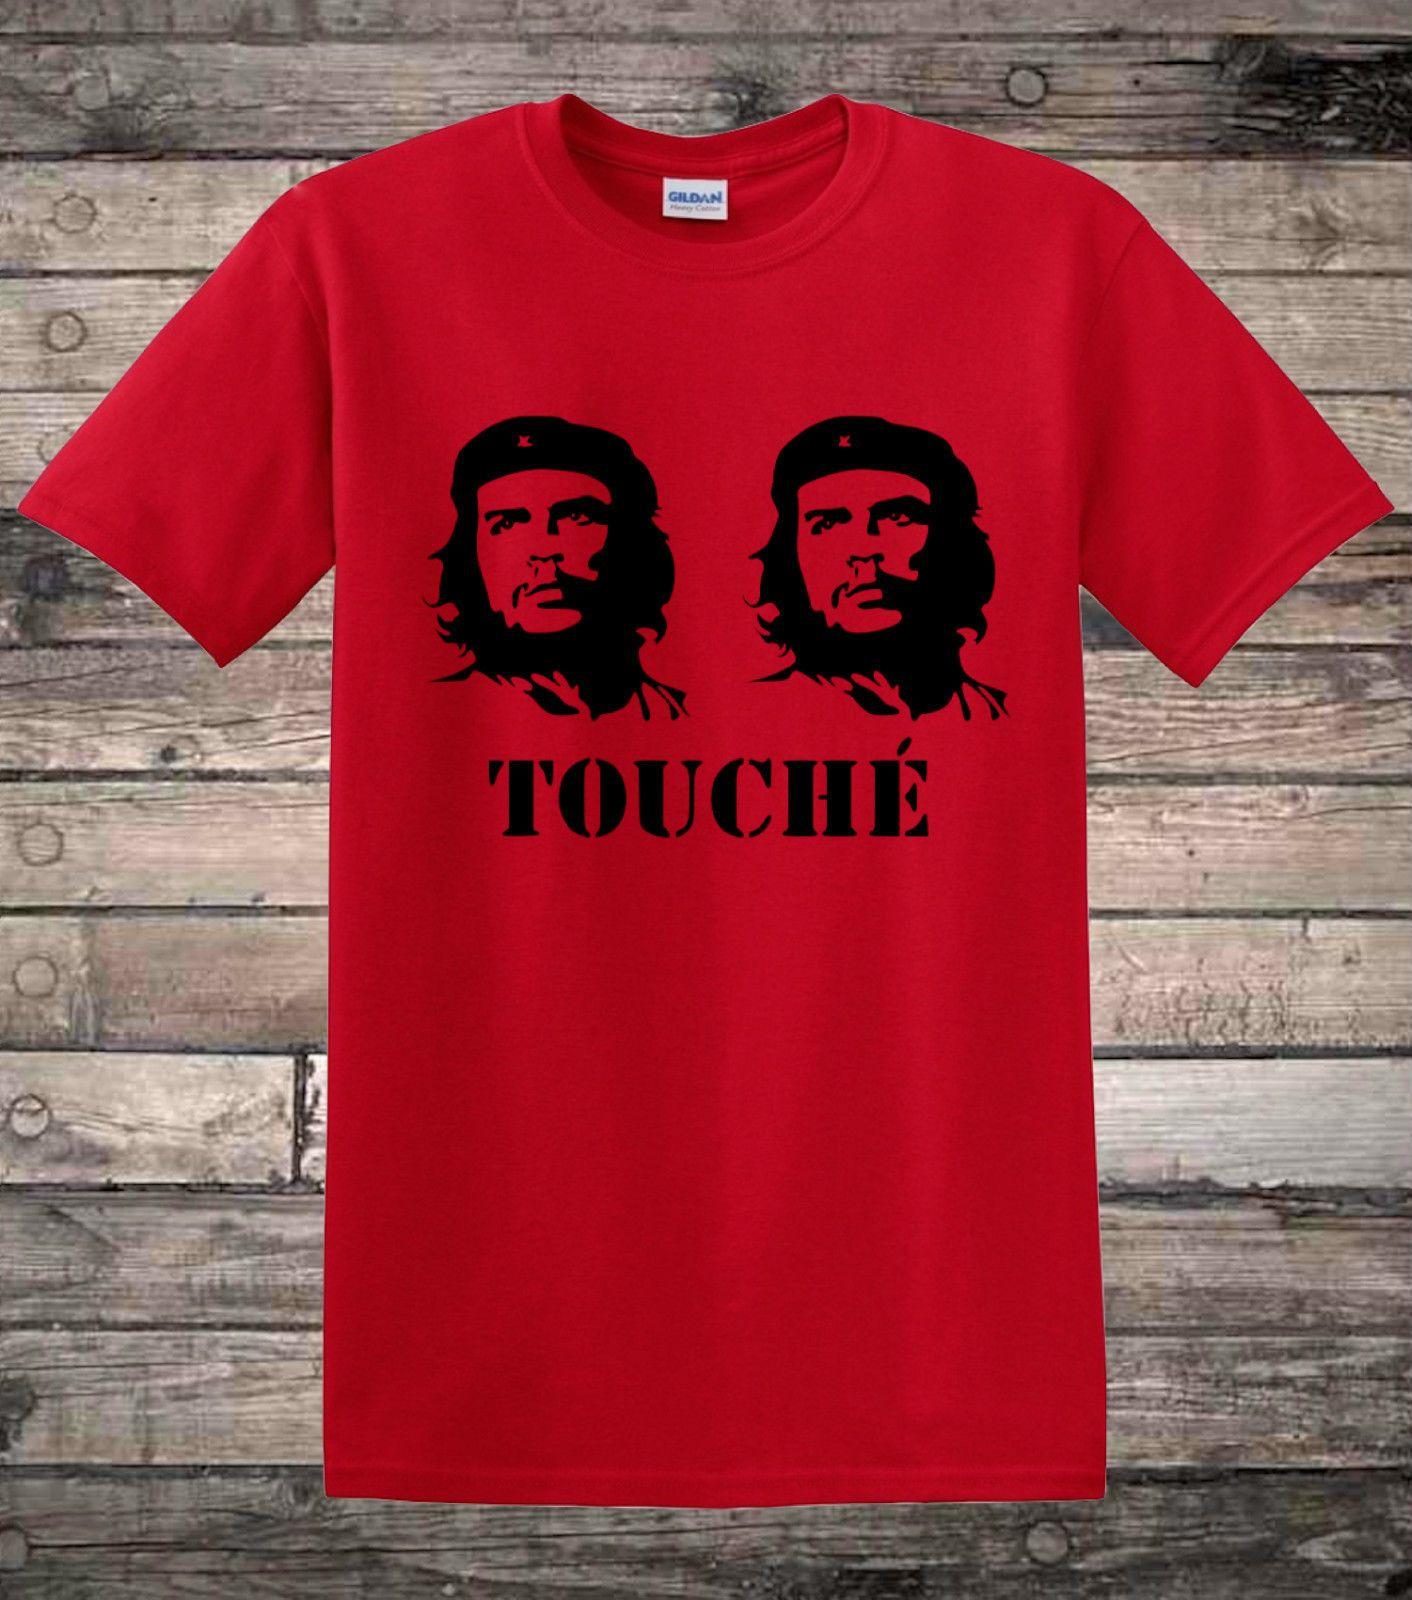 che guevara touche ironic retro political socialist t shirt